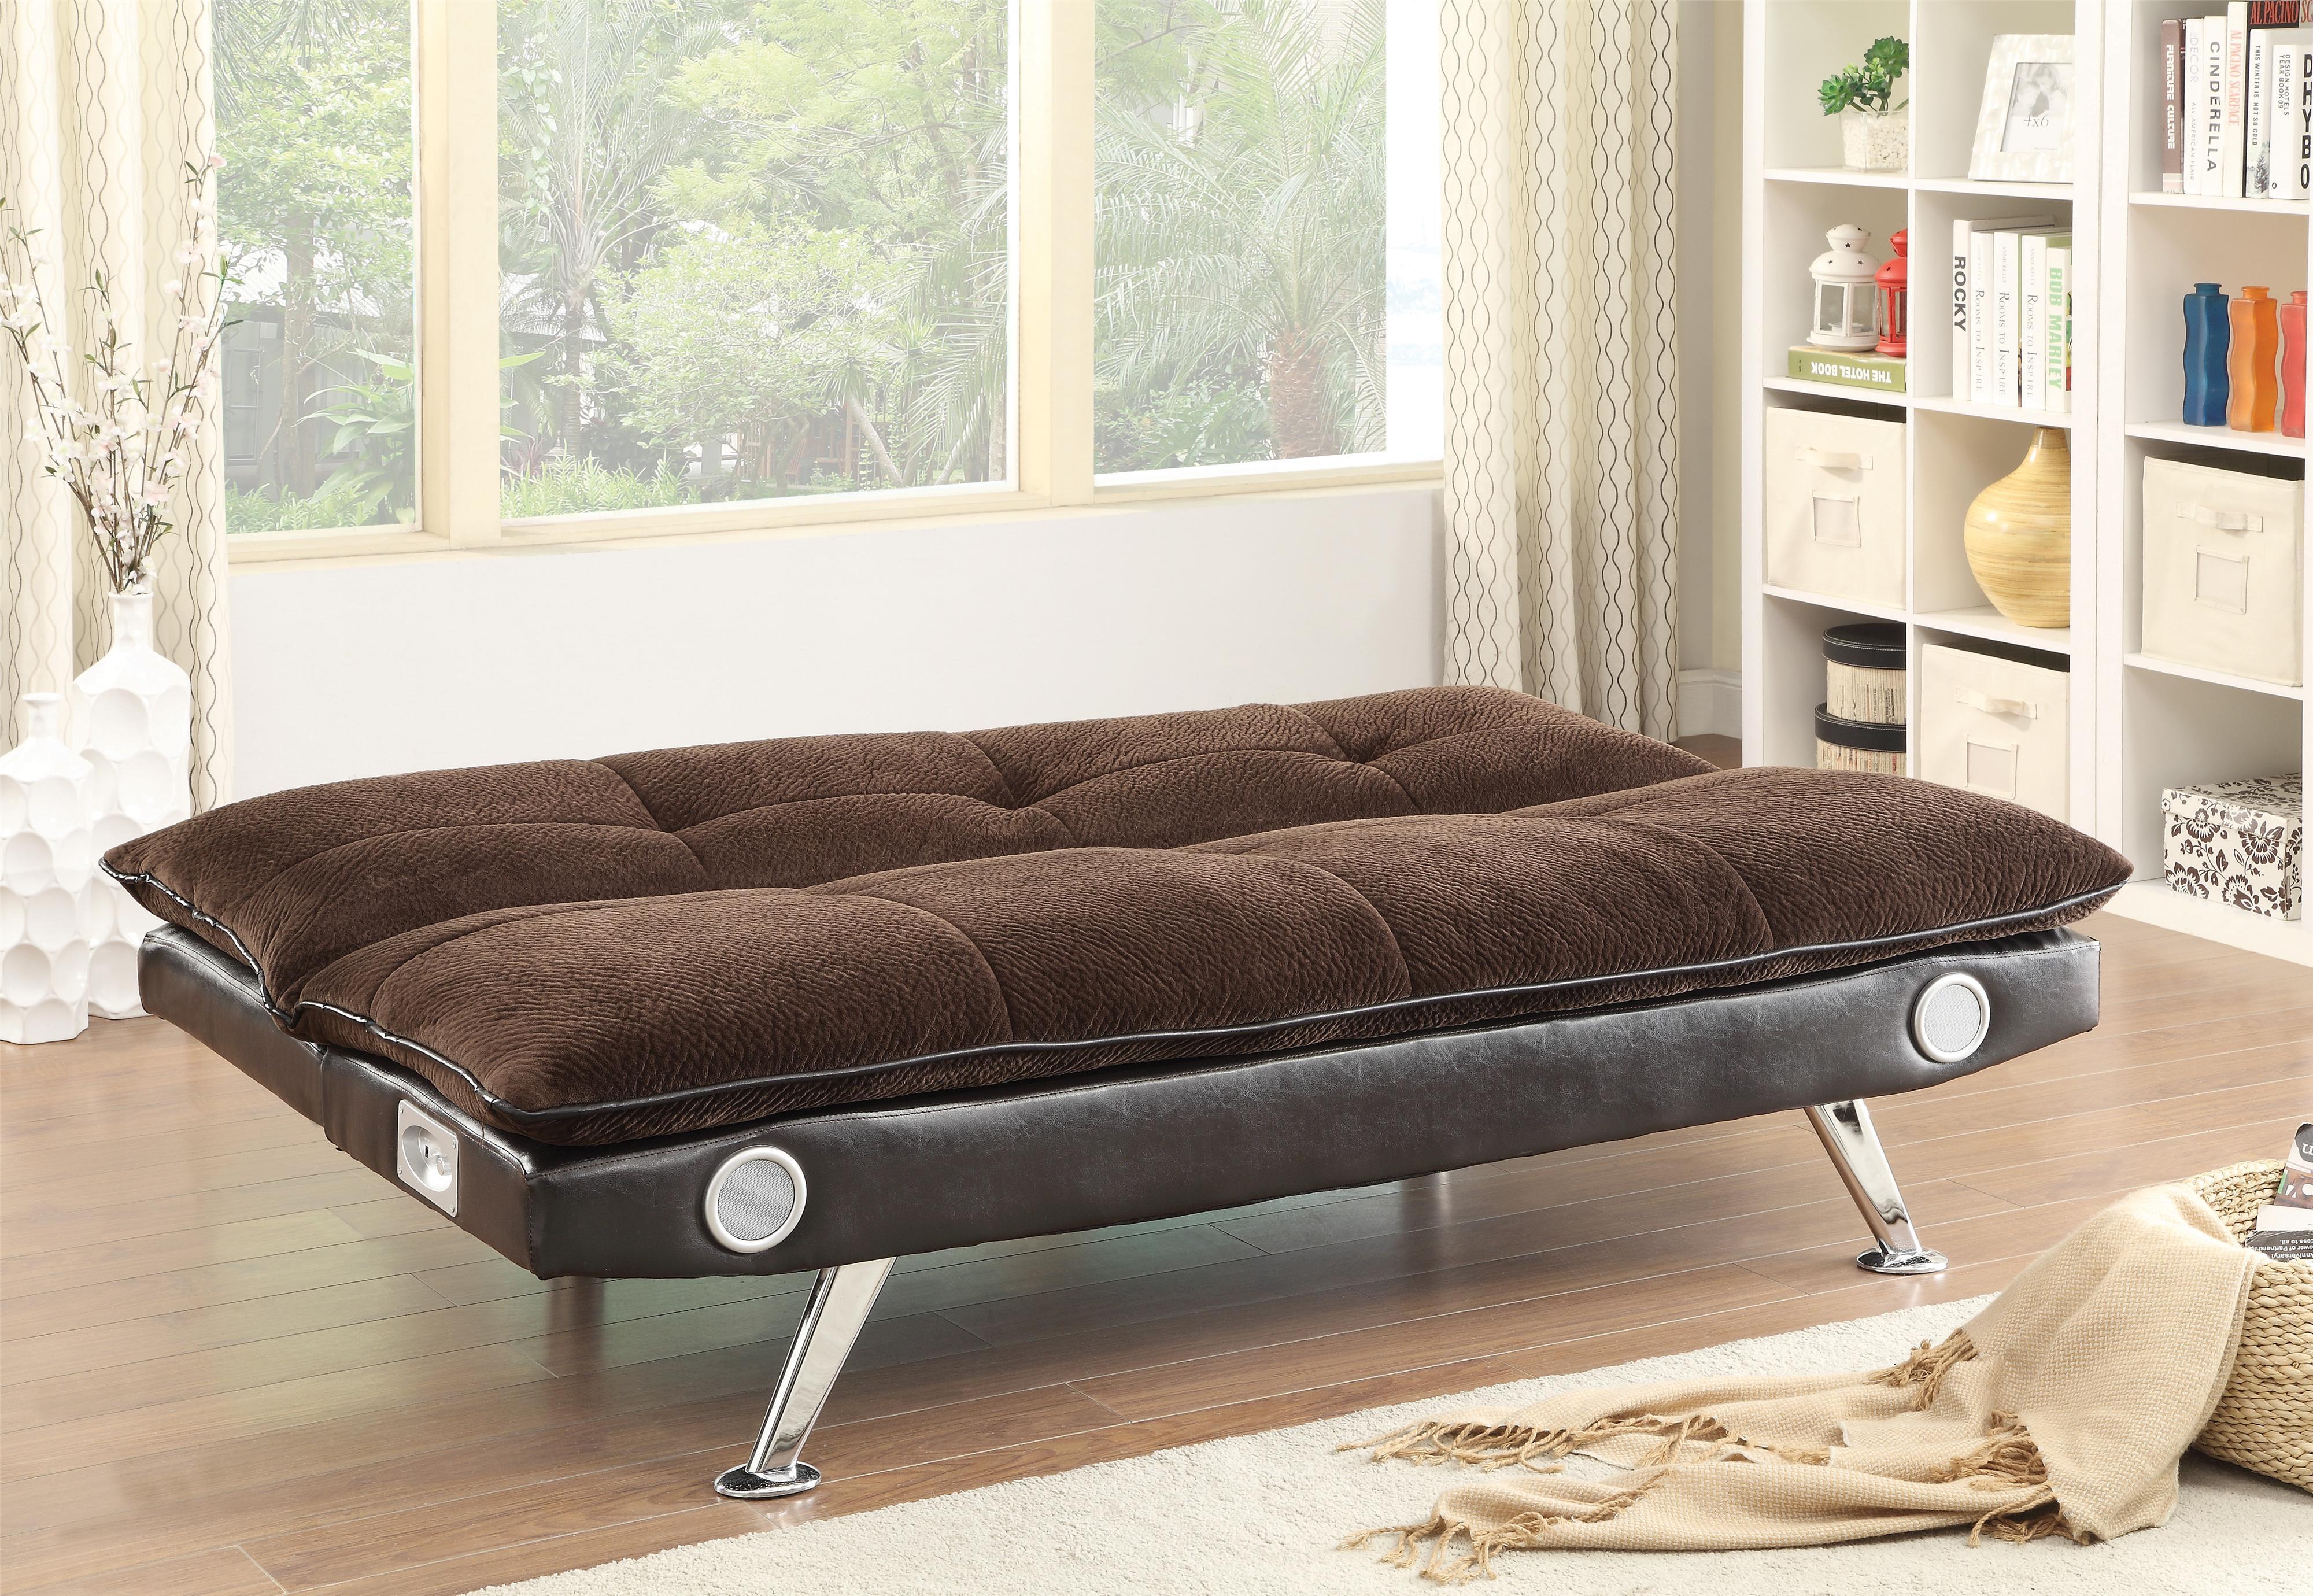 500047 sofa bed by coaster furniture genesis furniture for Coaster furniture